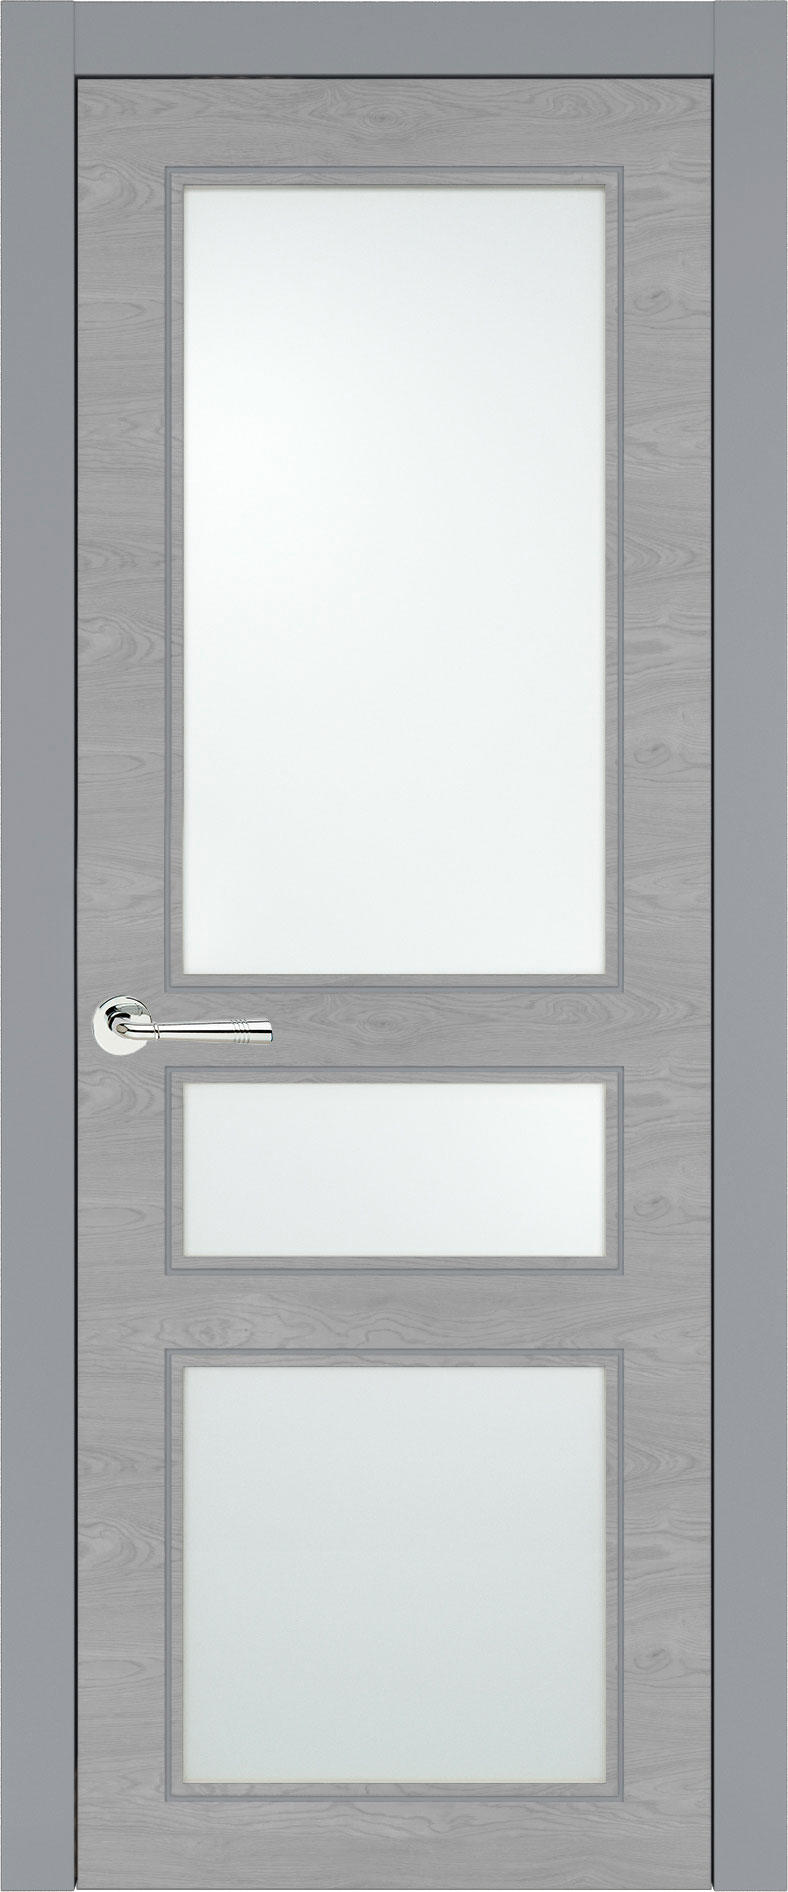 Imperia-R Neo Classic цвет - Серебристо-серая эмаль по шпону (RAL 7045) Со стеклом (ДО)